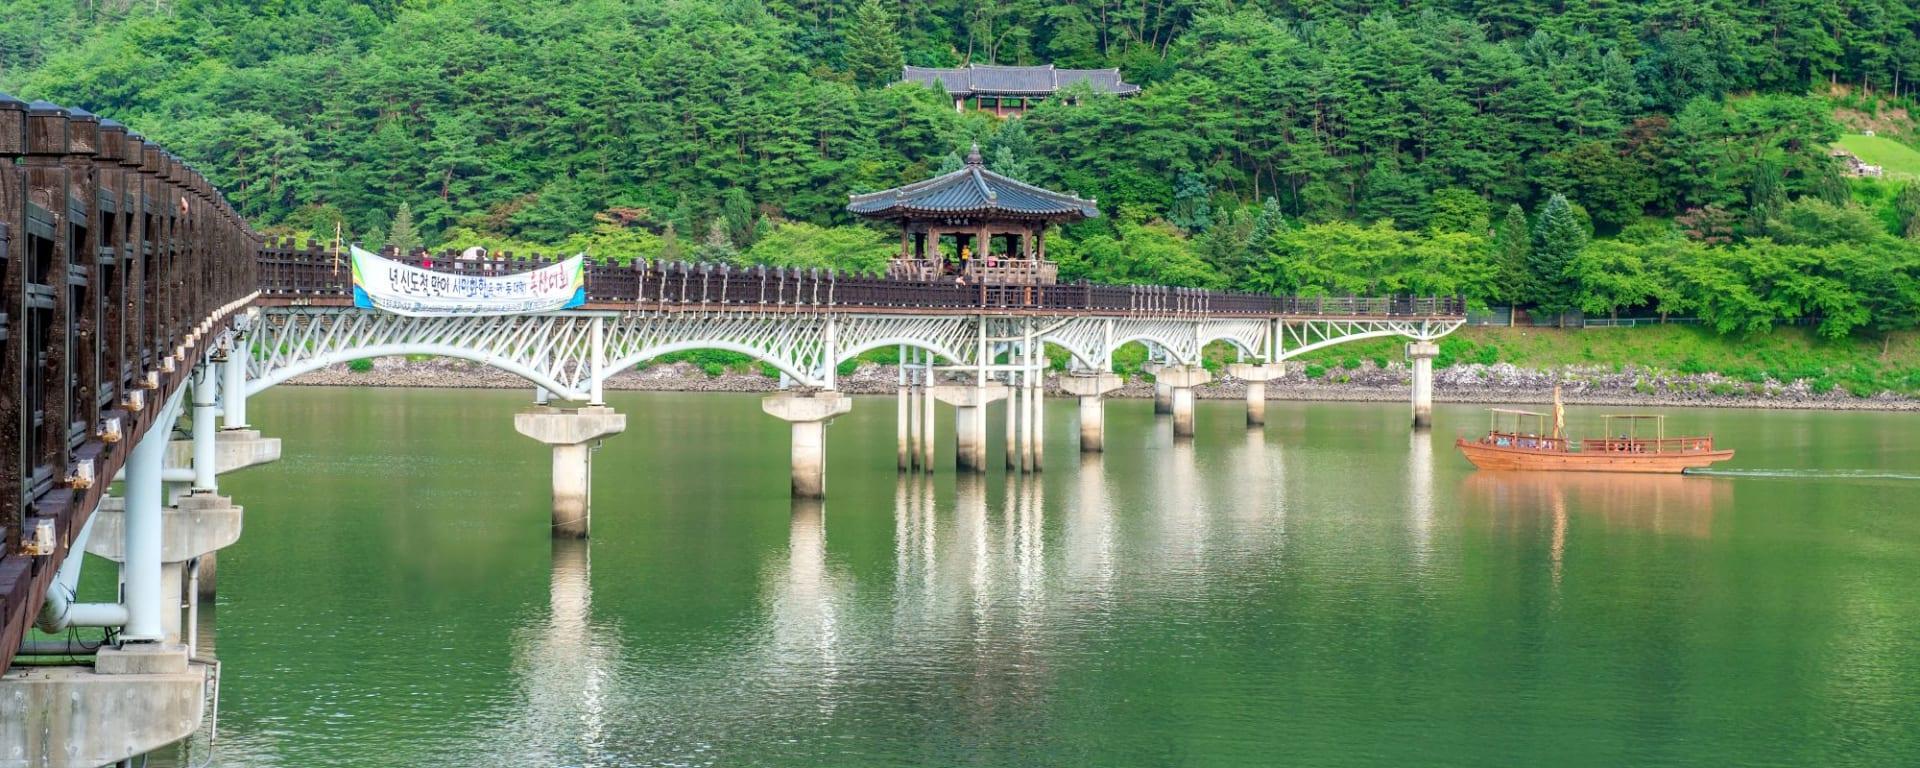 Südkorea - Grosse Mietwagenrundreise ab Seoul: Andong Wooden bridge or Wolyeonggyo bridge